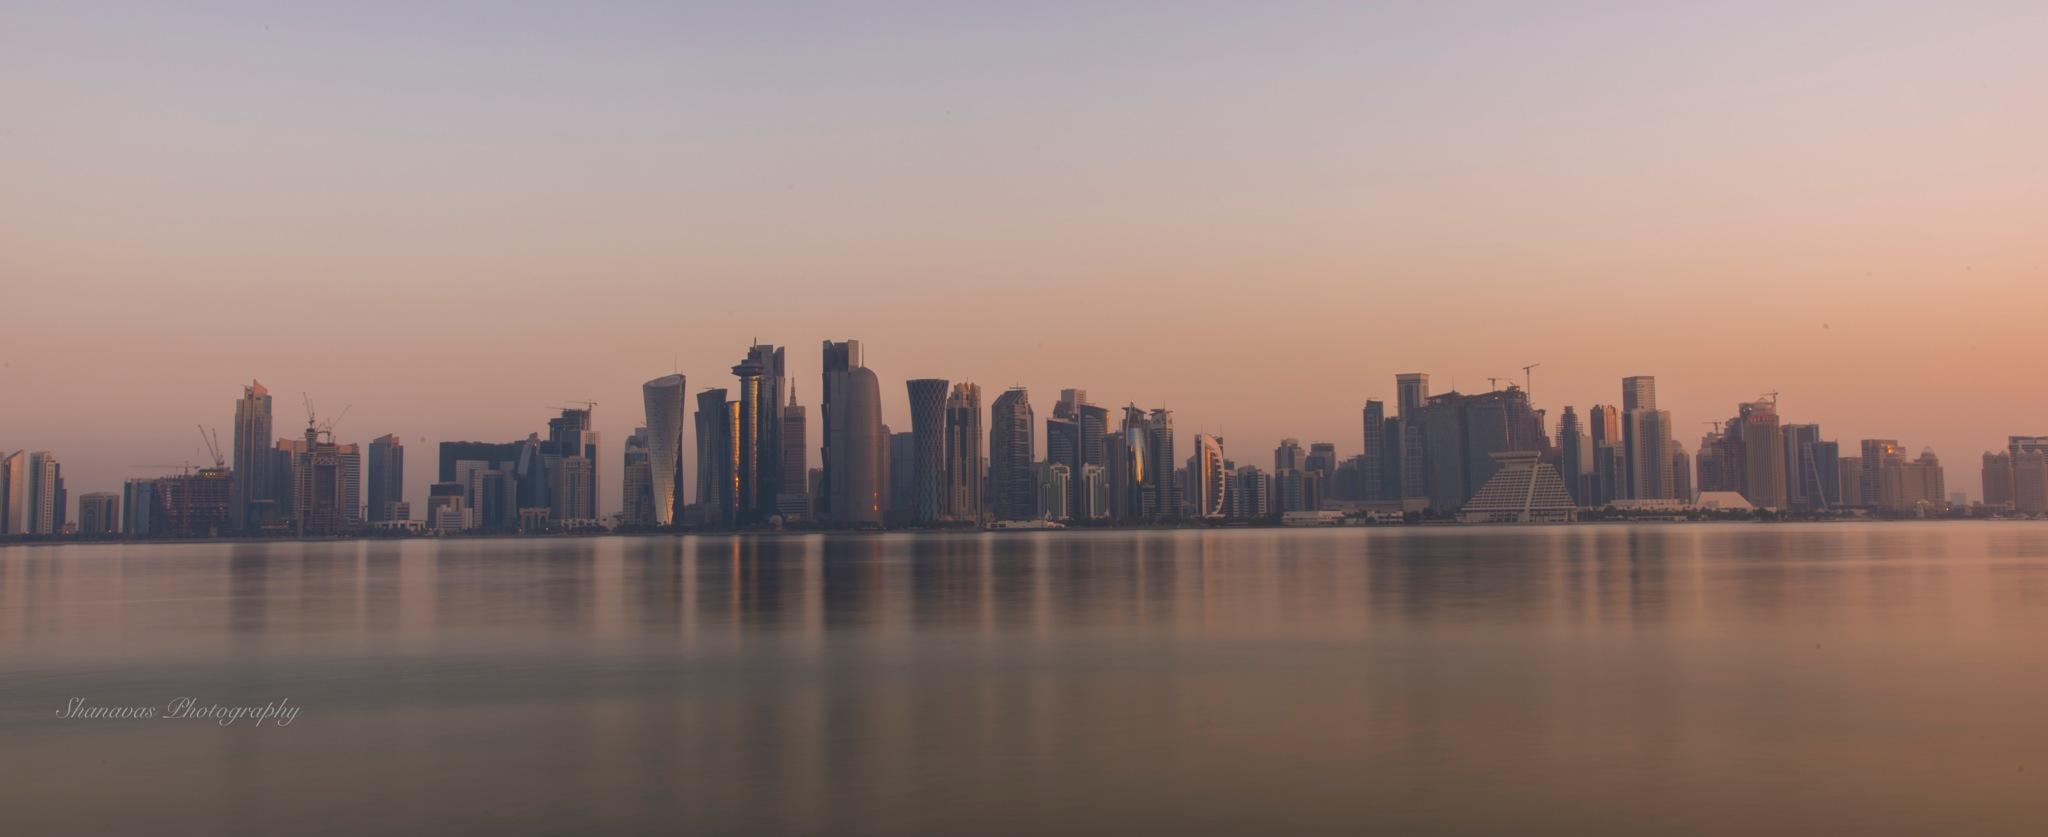 City View by SHANAVAS KT